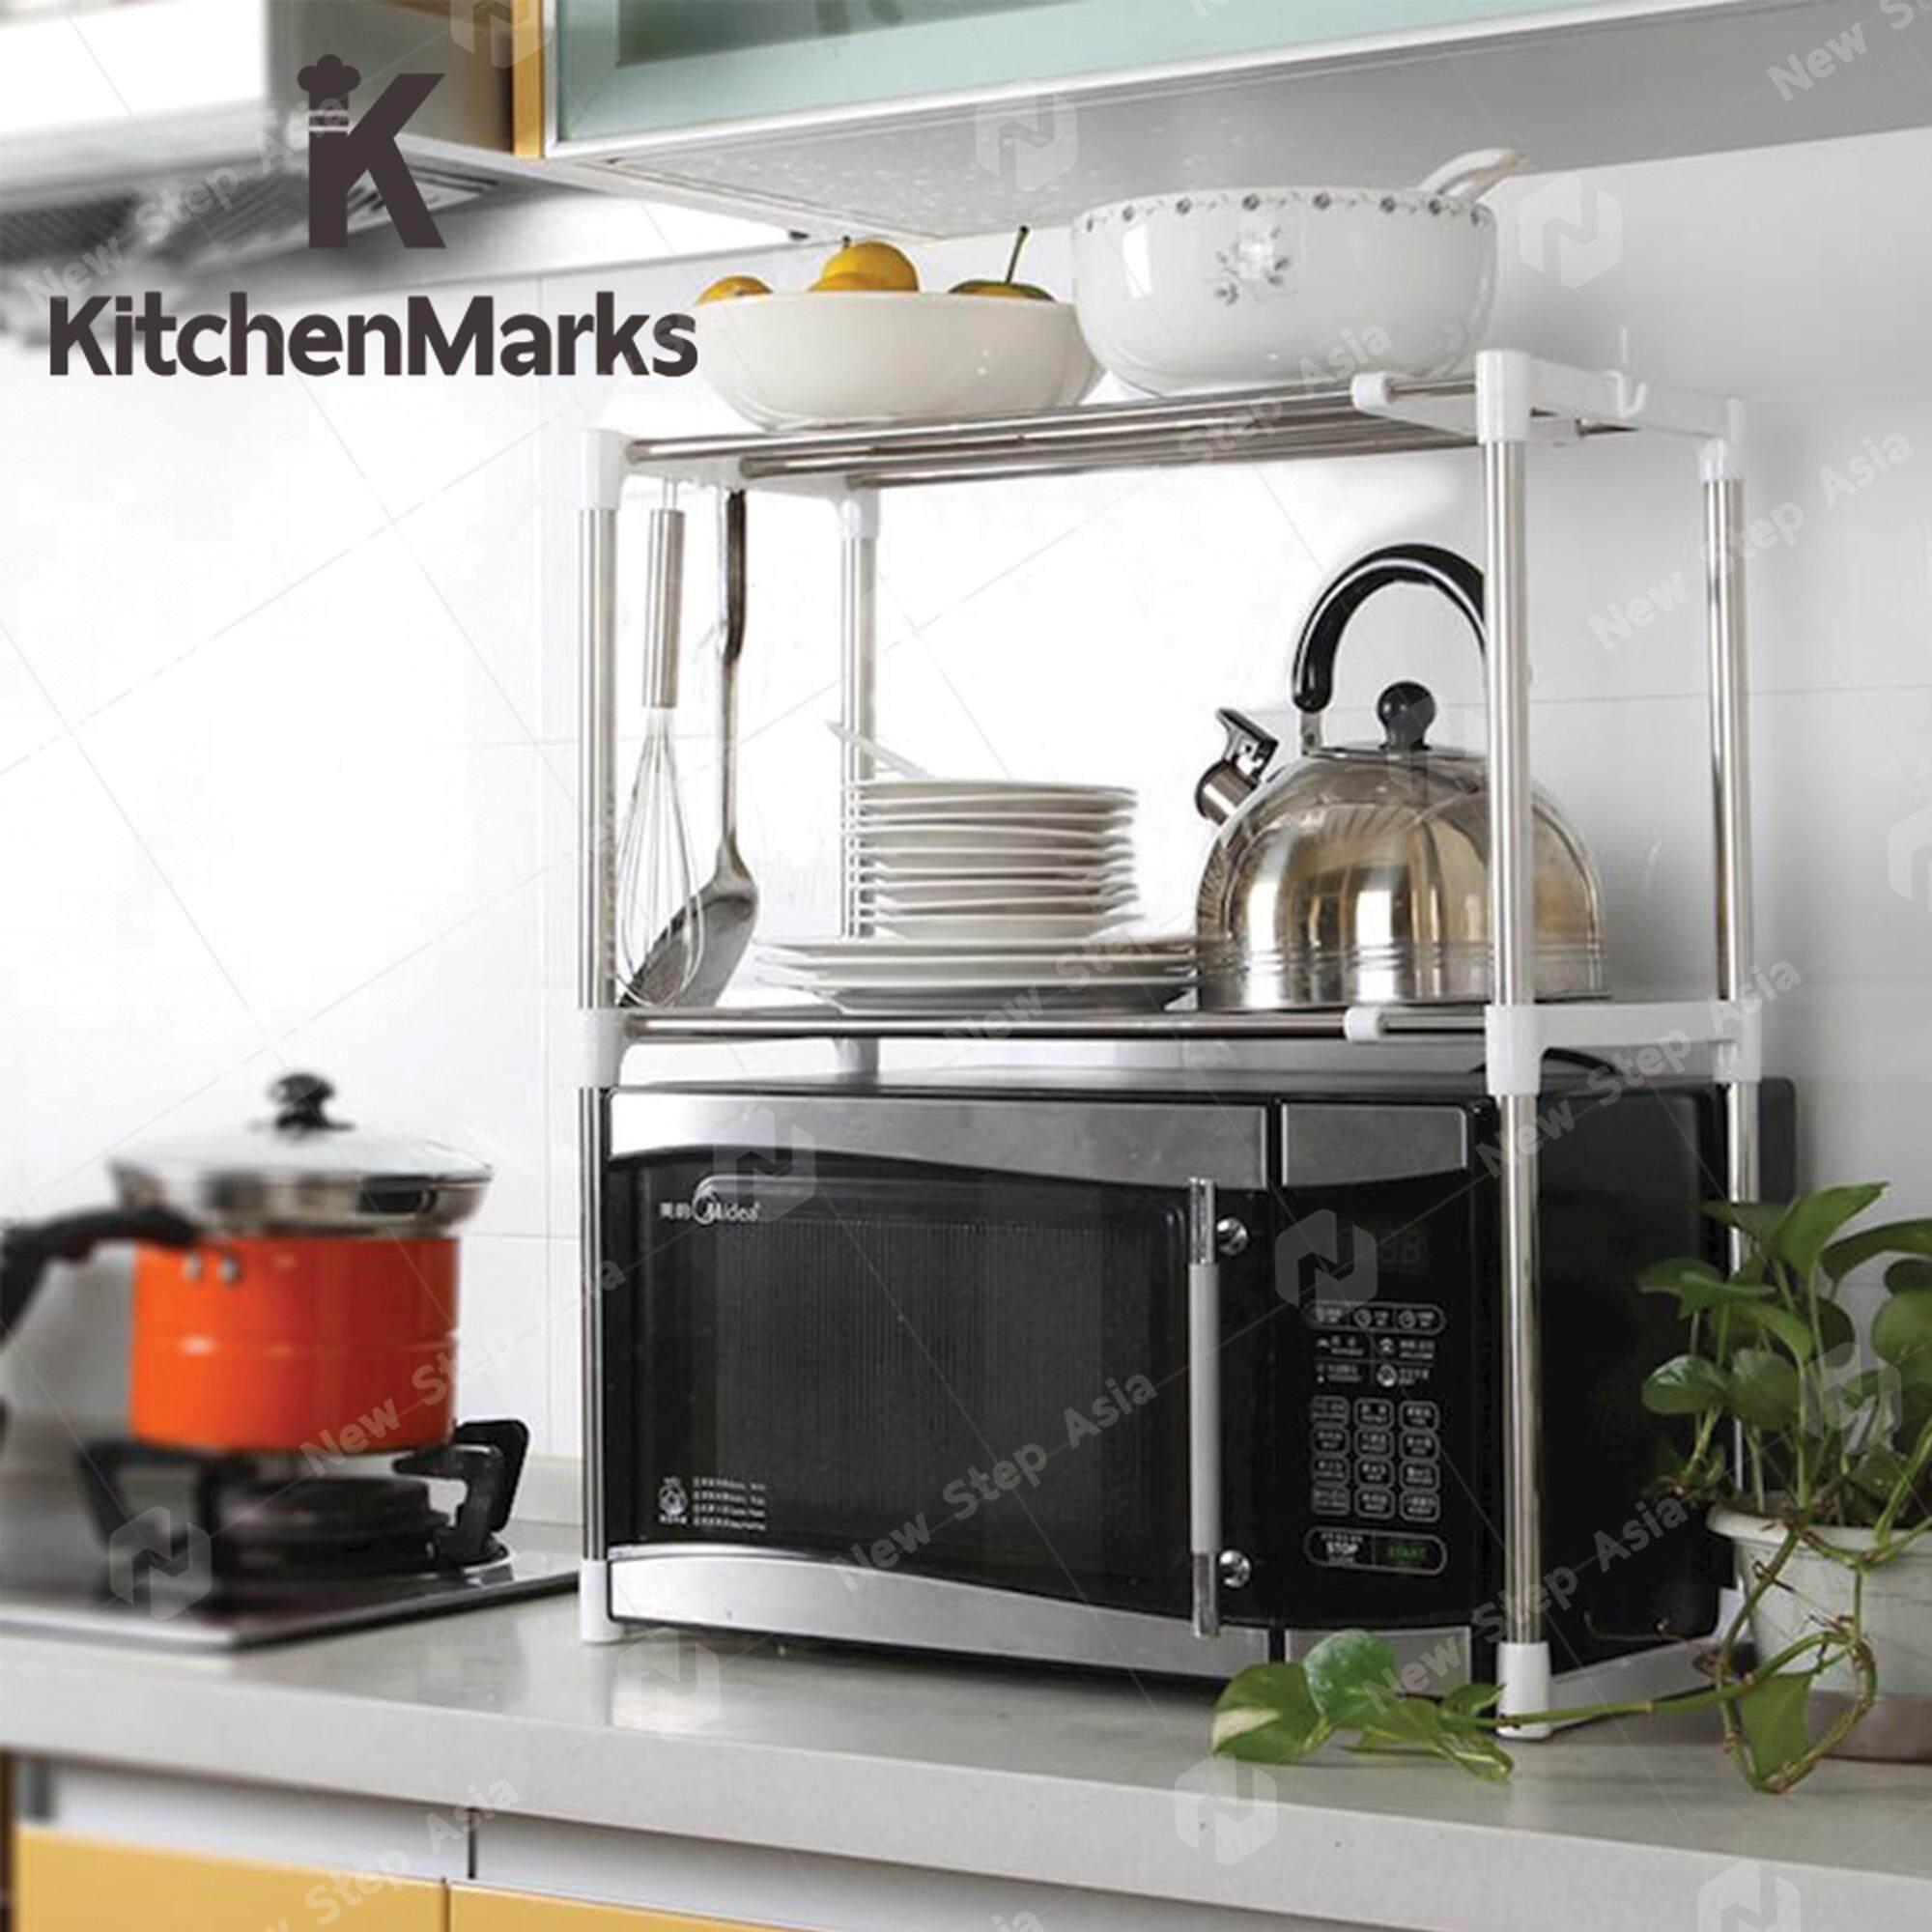 KitchenMarks ชั้นวางคร่อมไมโครเวฟ ชั้นวางของสแตนเลส ชั้นสแตนเลส ปรับความยาวได้ สำหรับวางของคร่อมไมโครเวฟ Microwave Rack Kitchen Shelves new step asia